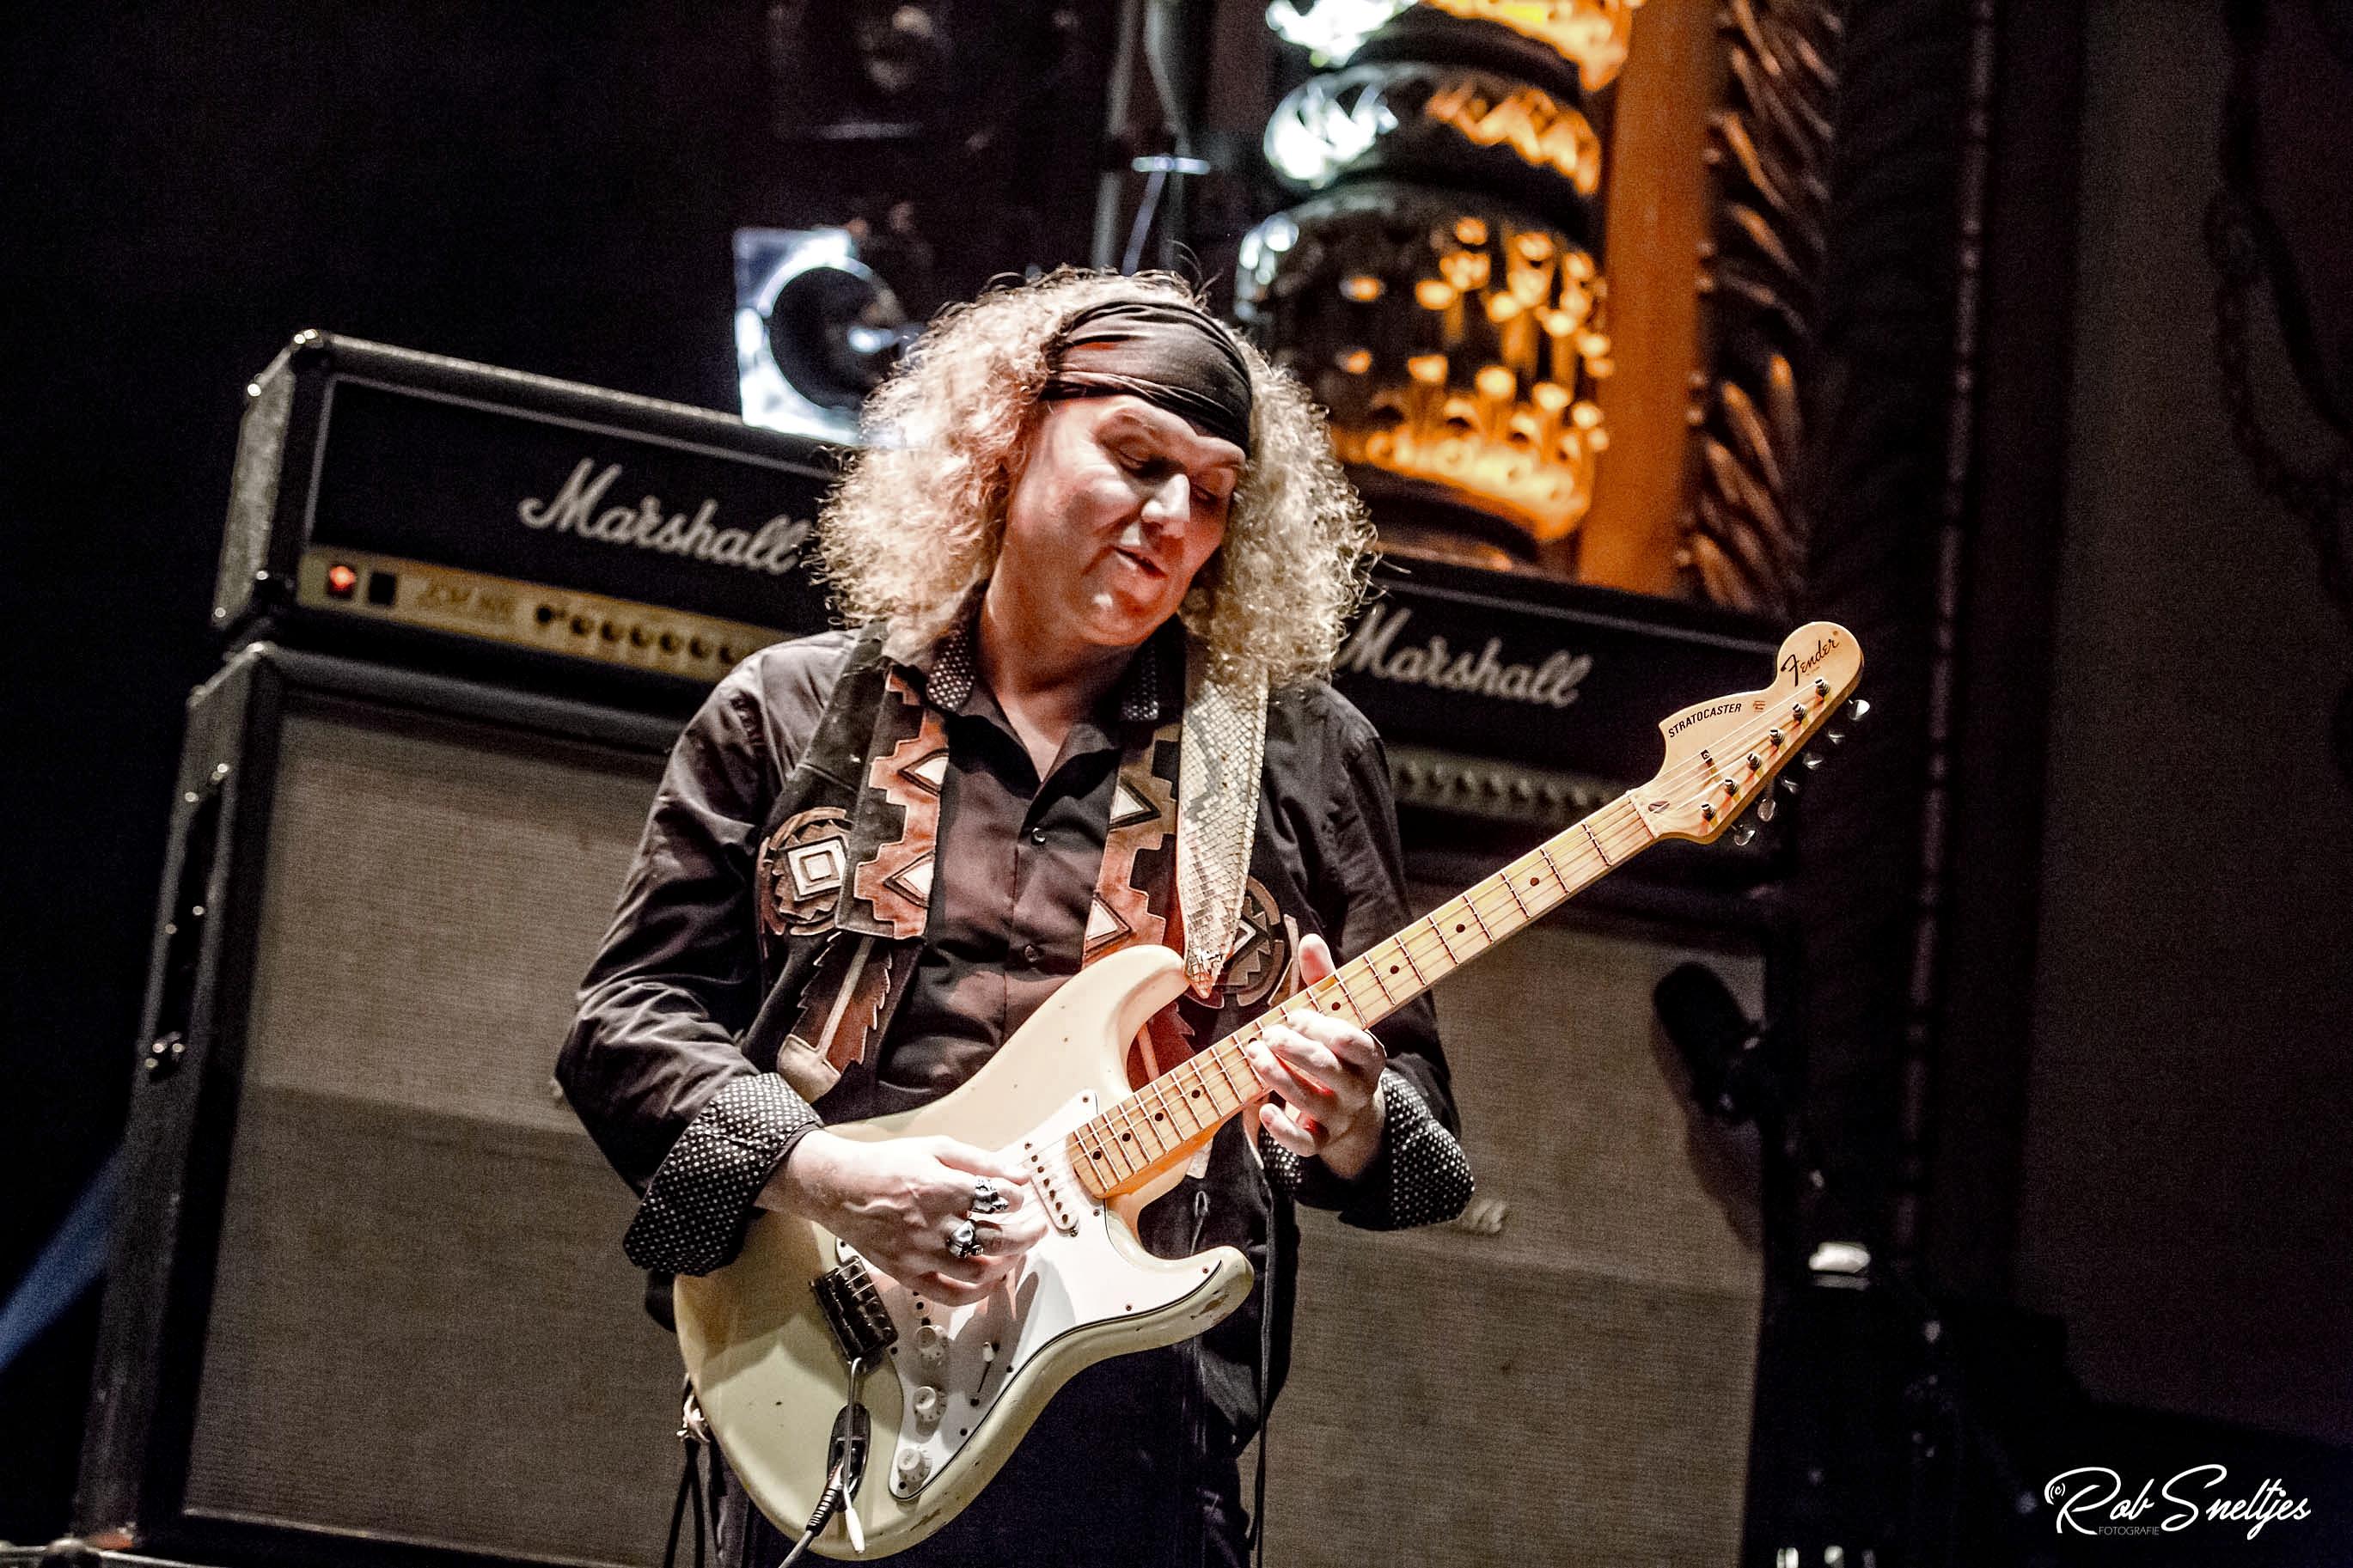 Julian-Sas-Band-Luxor-Live-Arnhem-2018-©RobSneltjes6K4A5273-copy-52